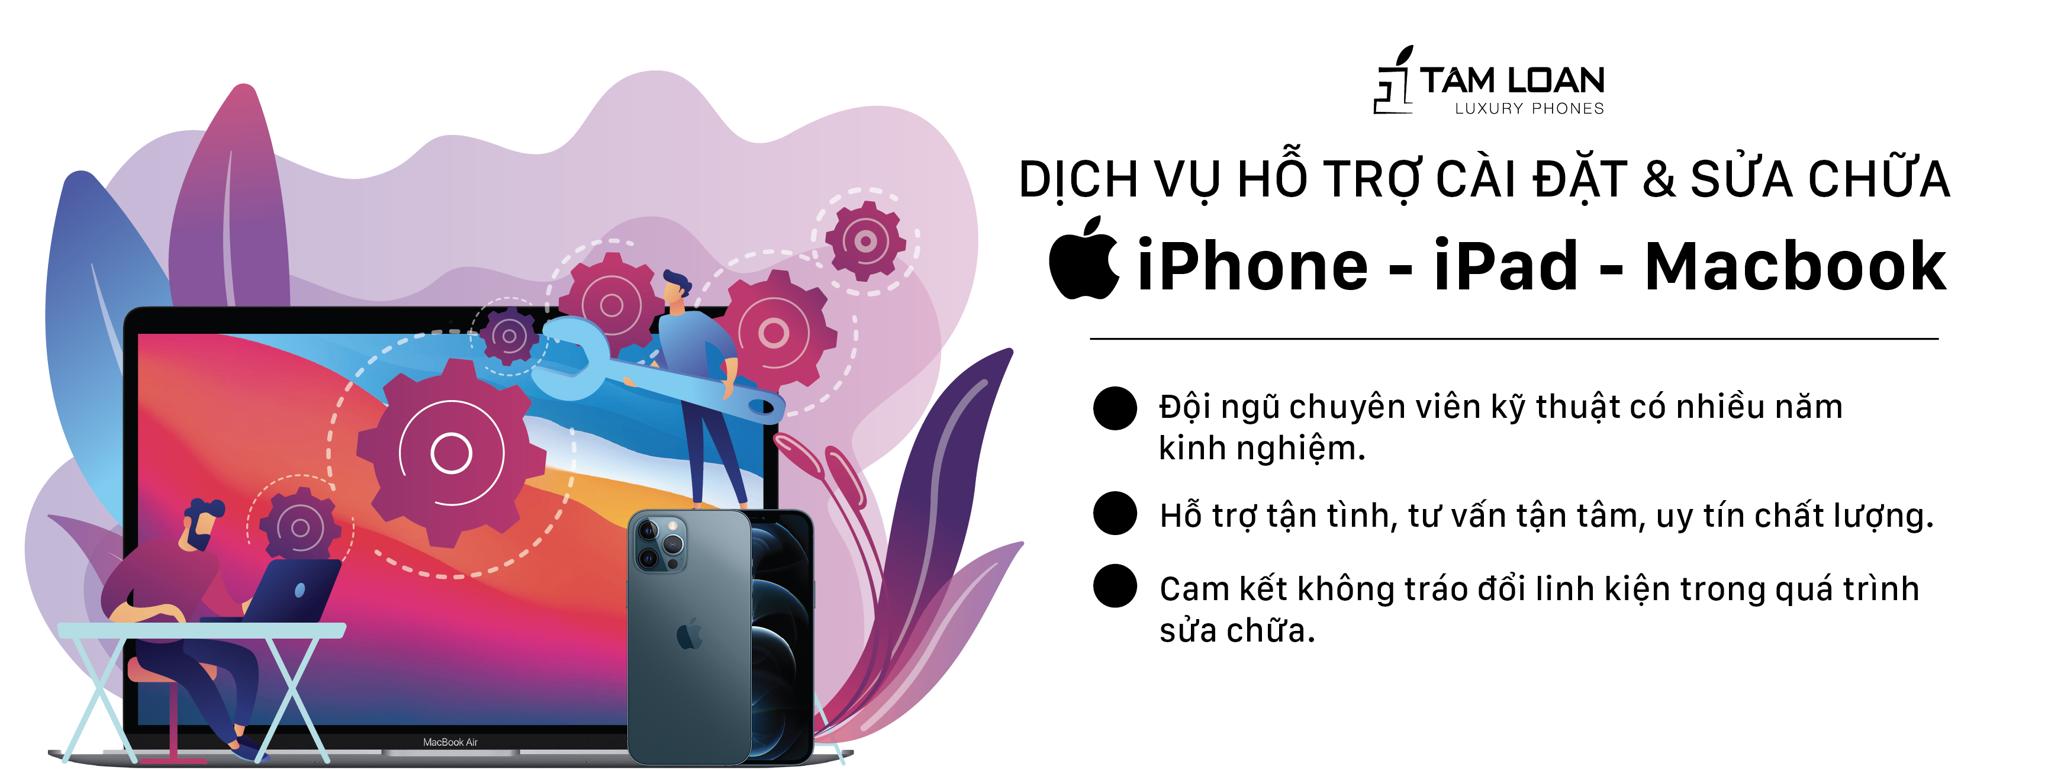 Linh Kiện iPhone 6